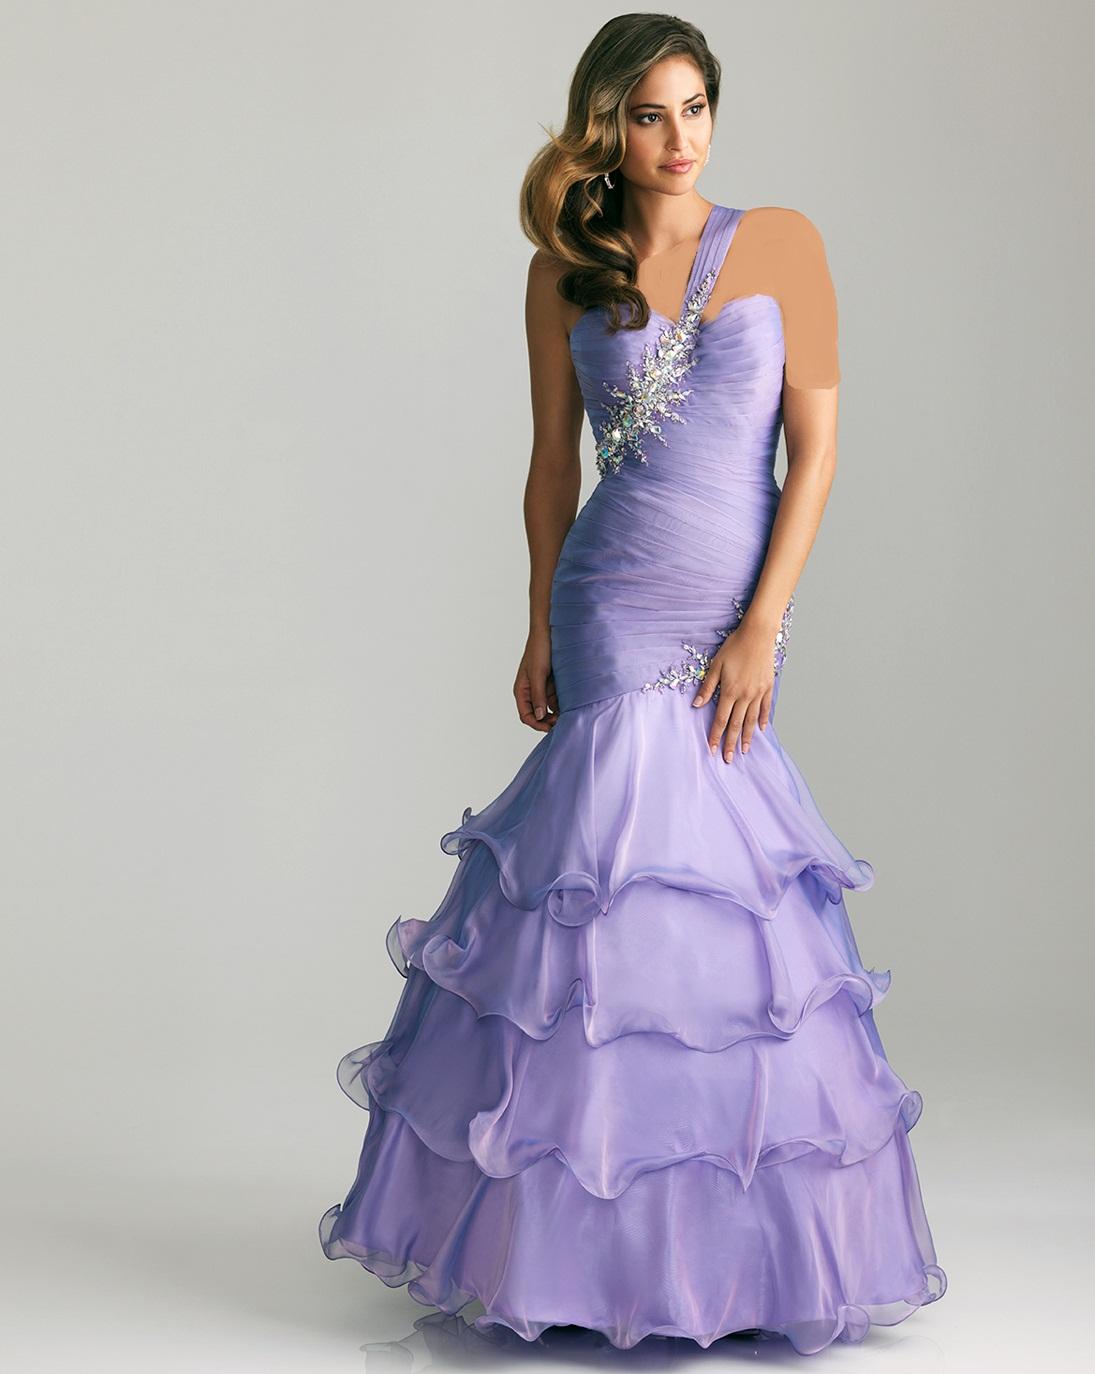 http://www.uplooder.net/img/image/1/2ca4a716bc6f589bf38d5beb9cb649e5/purple-mermaid-prom-dresses.jpg